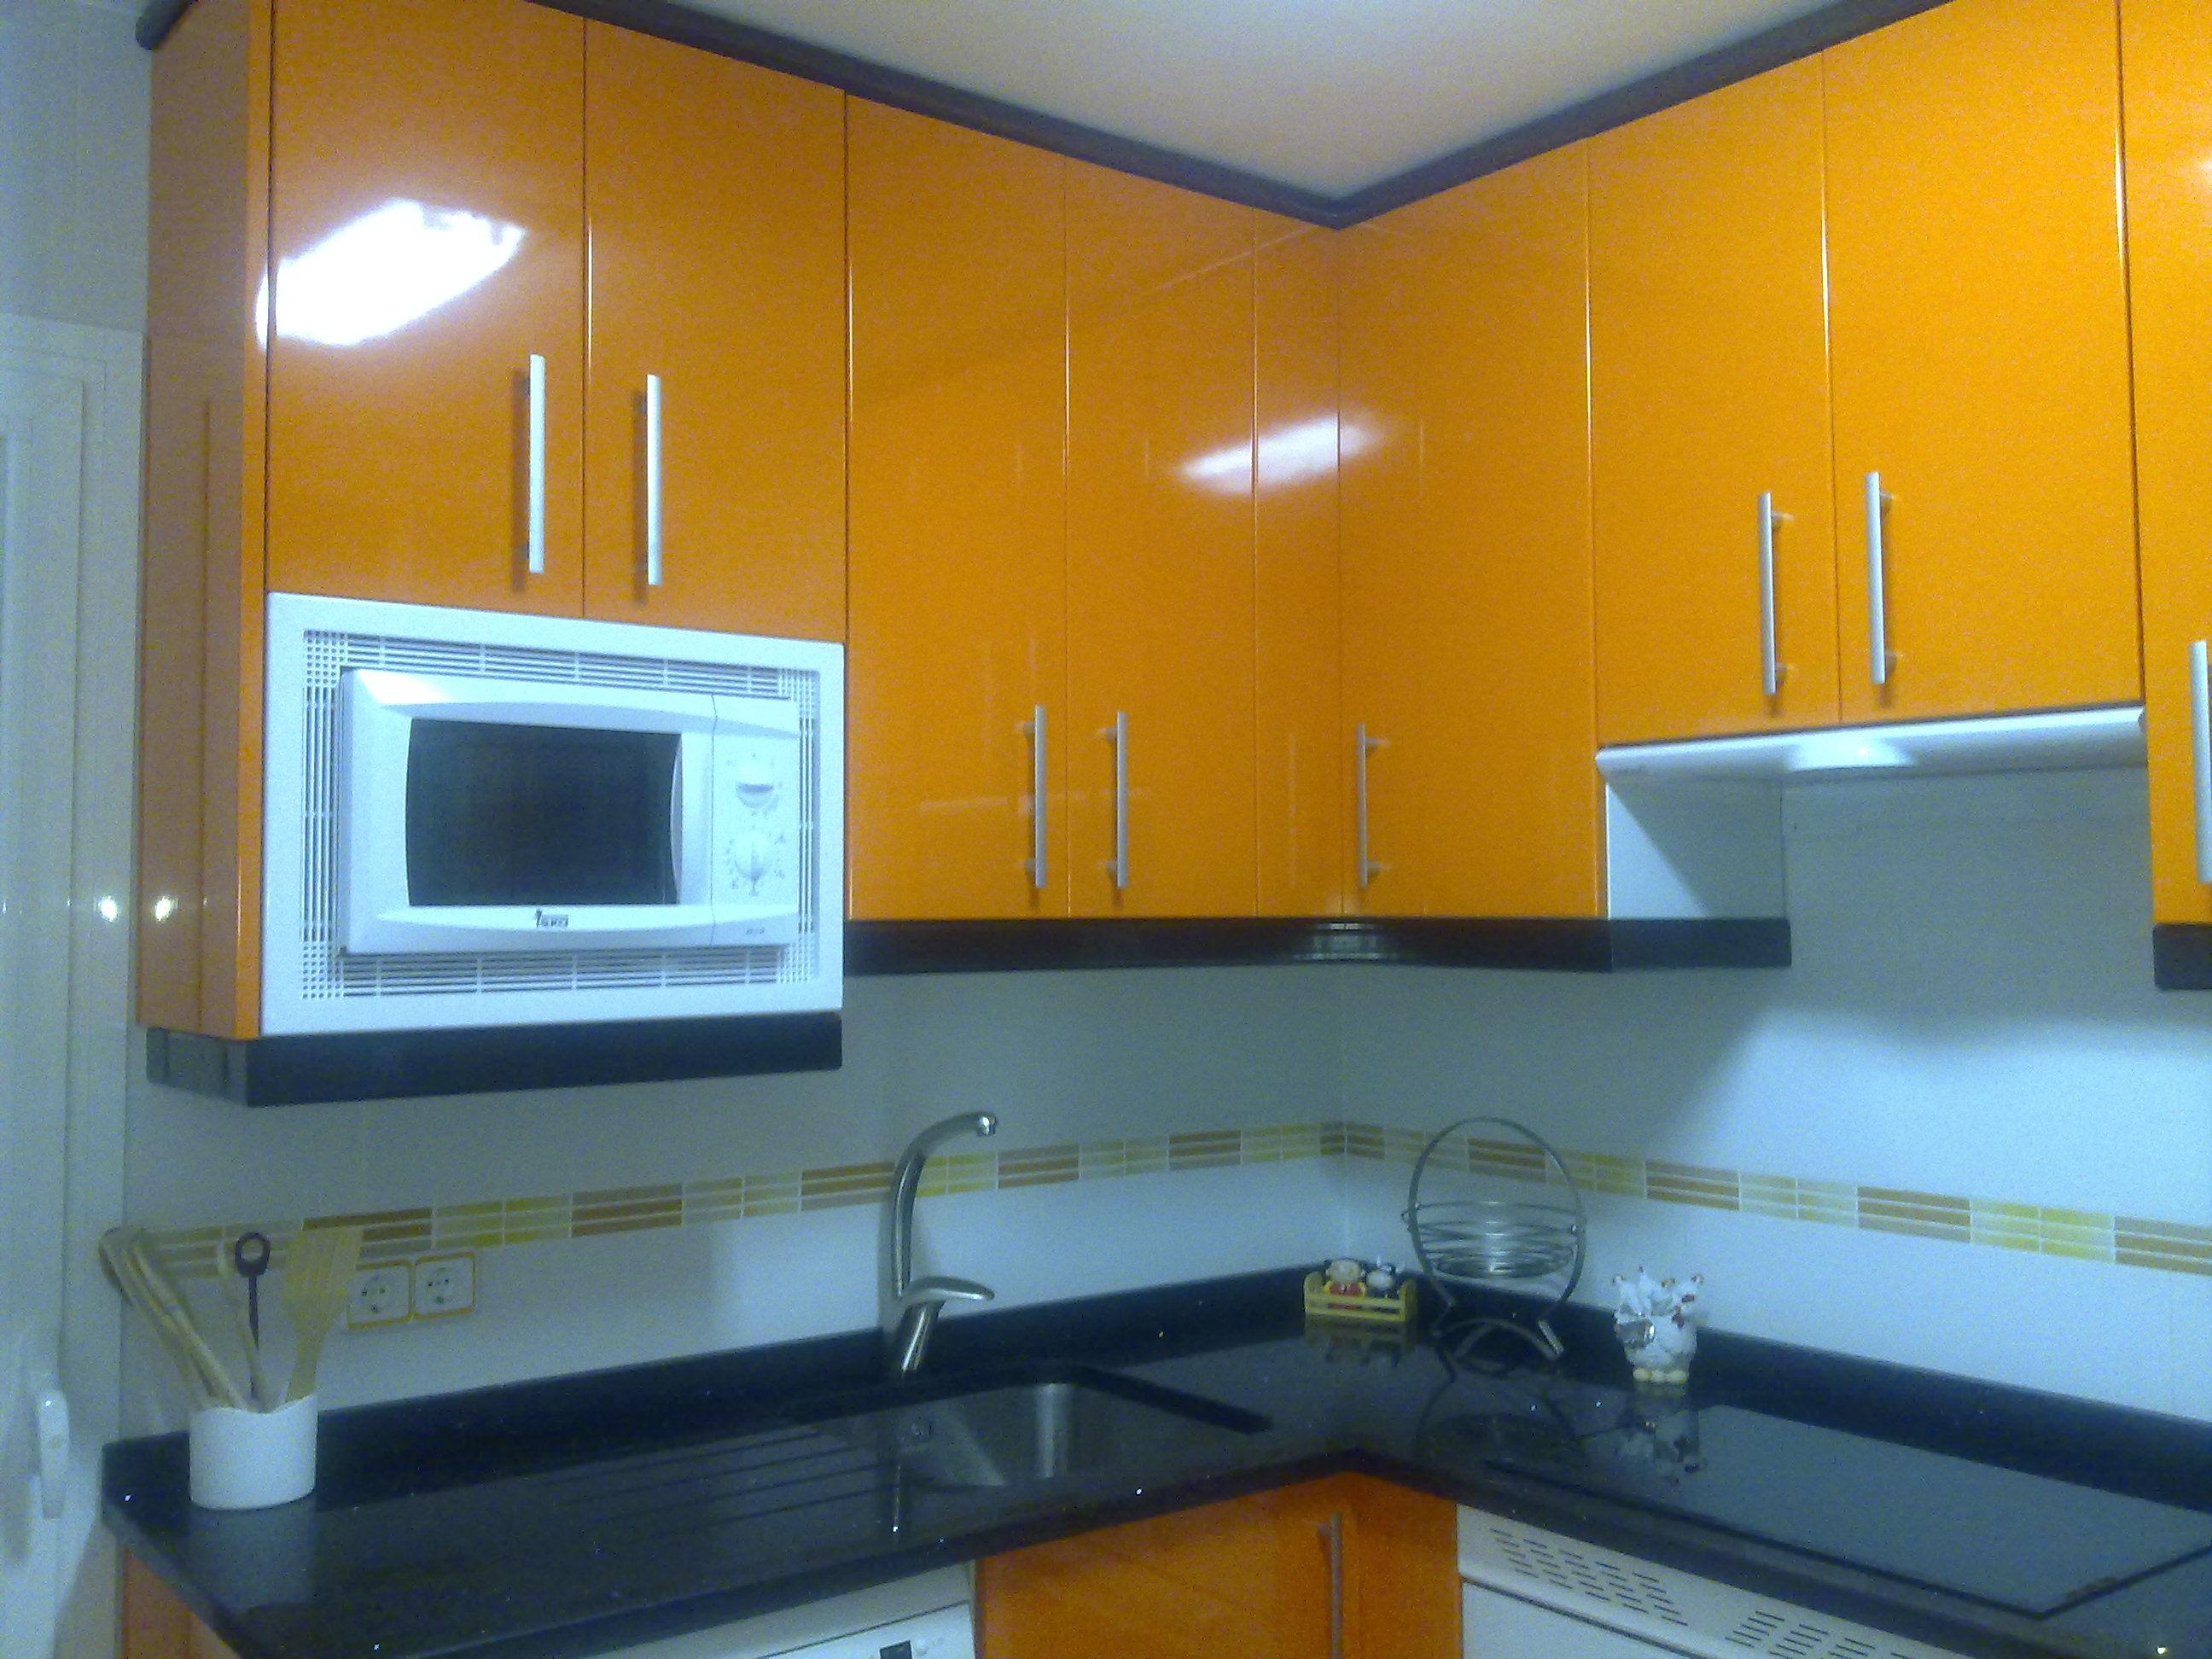 laminado alto brillo naranja, remates negro, encimera silestone negro estellar